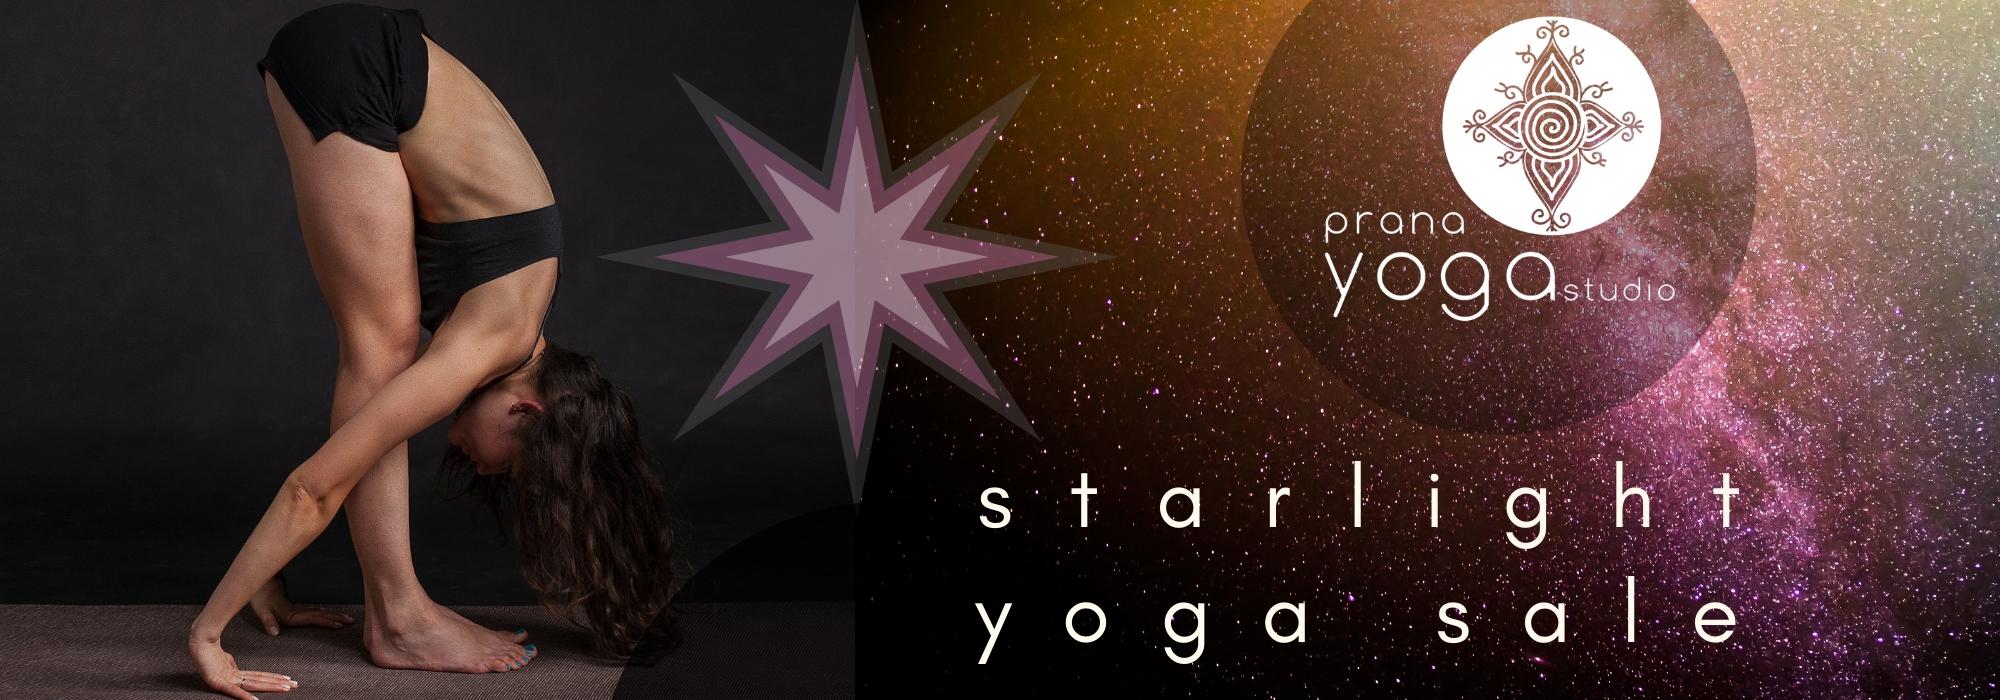 starlight_banner